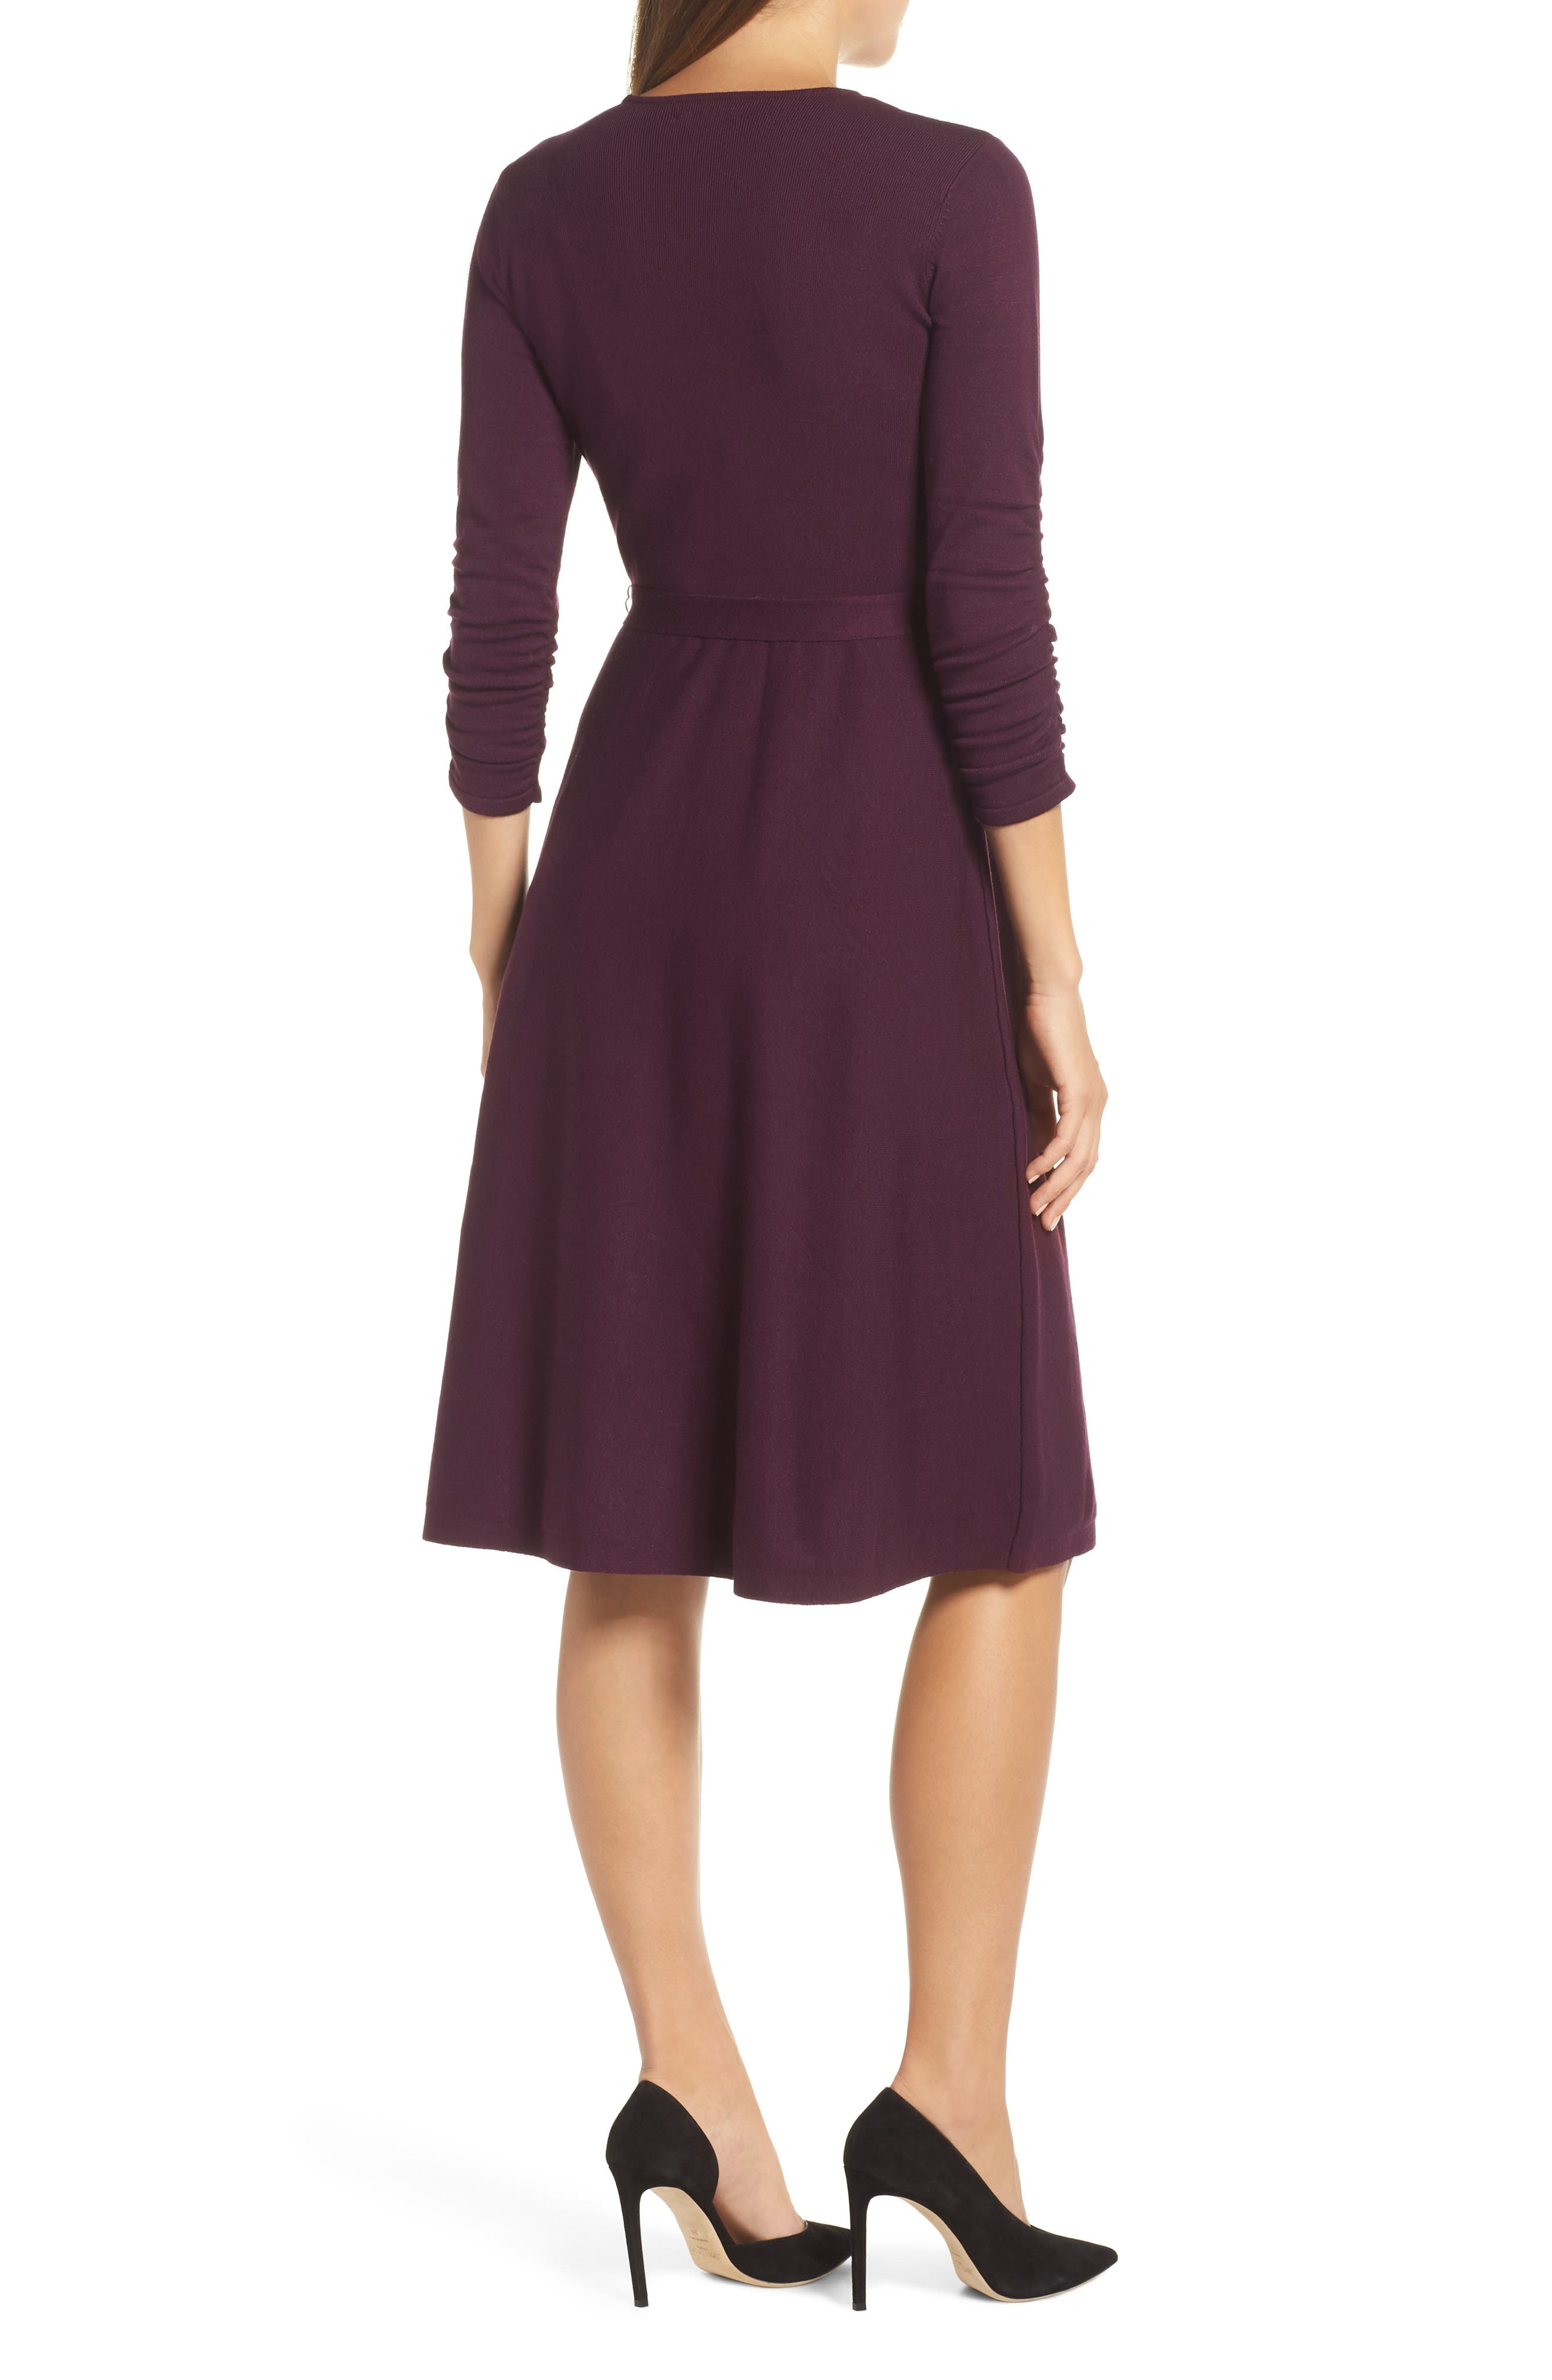 ELIZA J, Faux Wrap Sweater Dress, Alternate thumbnail 2, color, 930